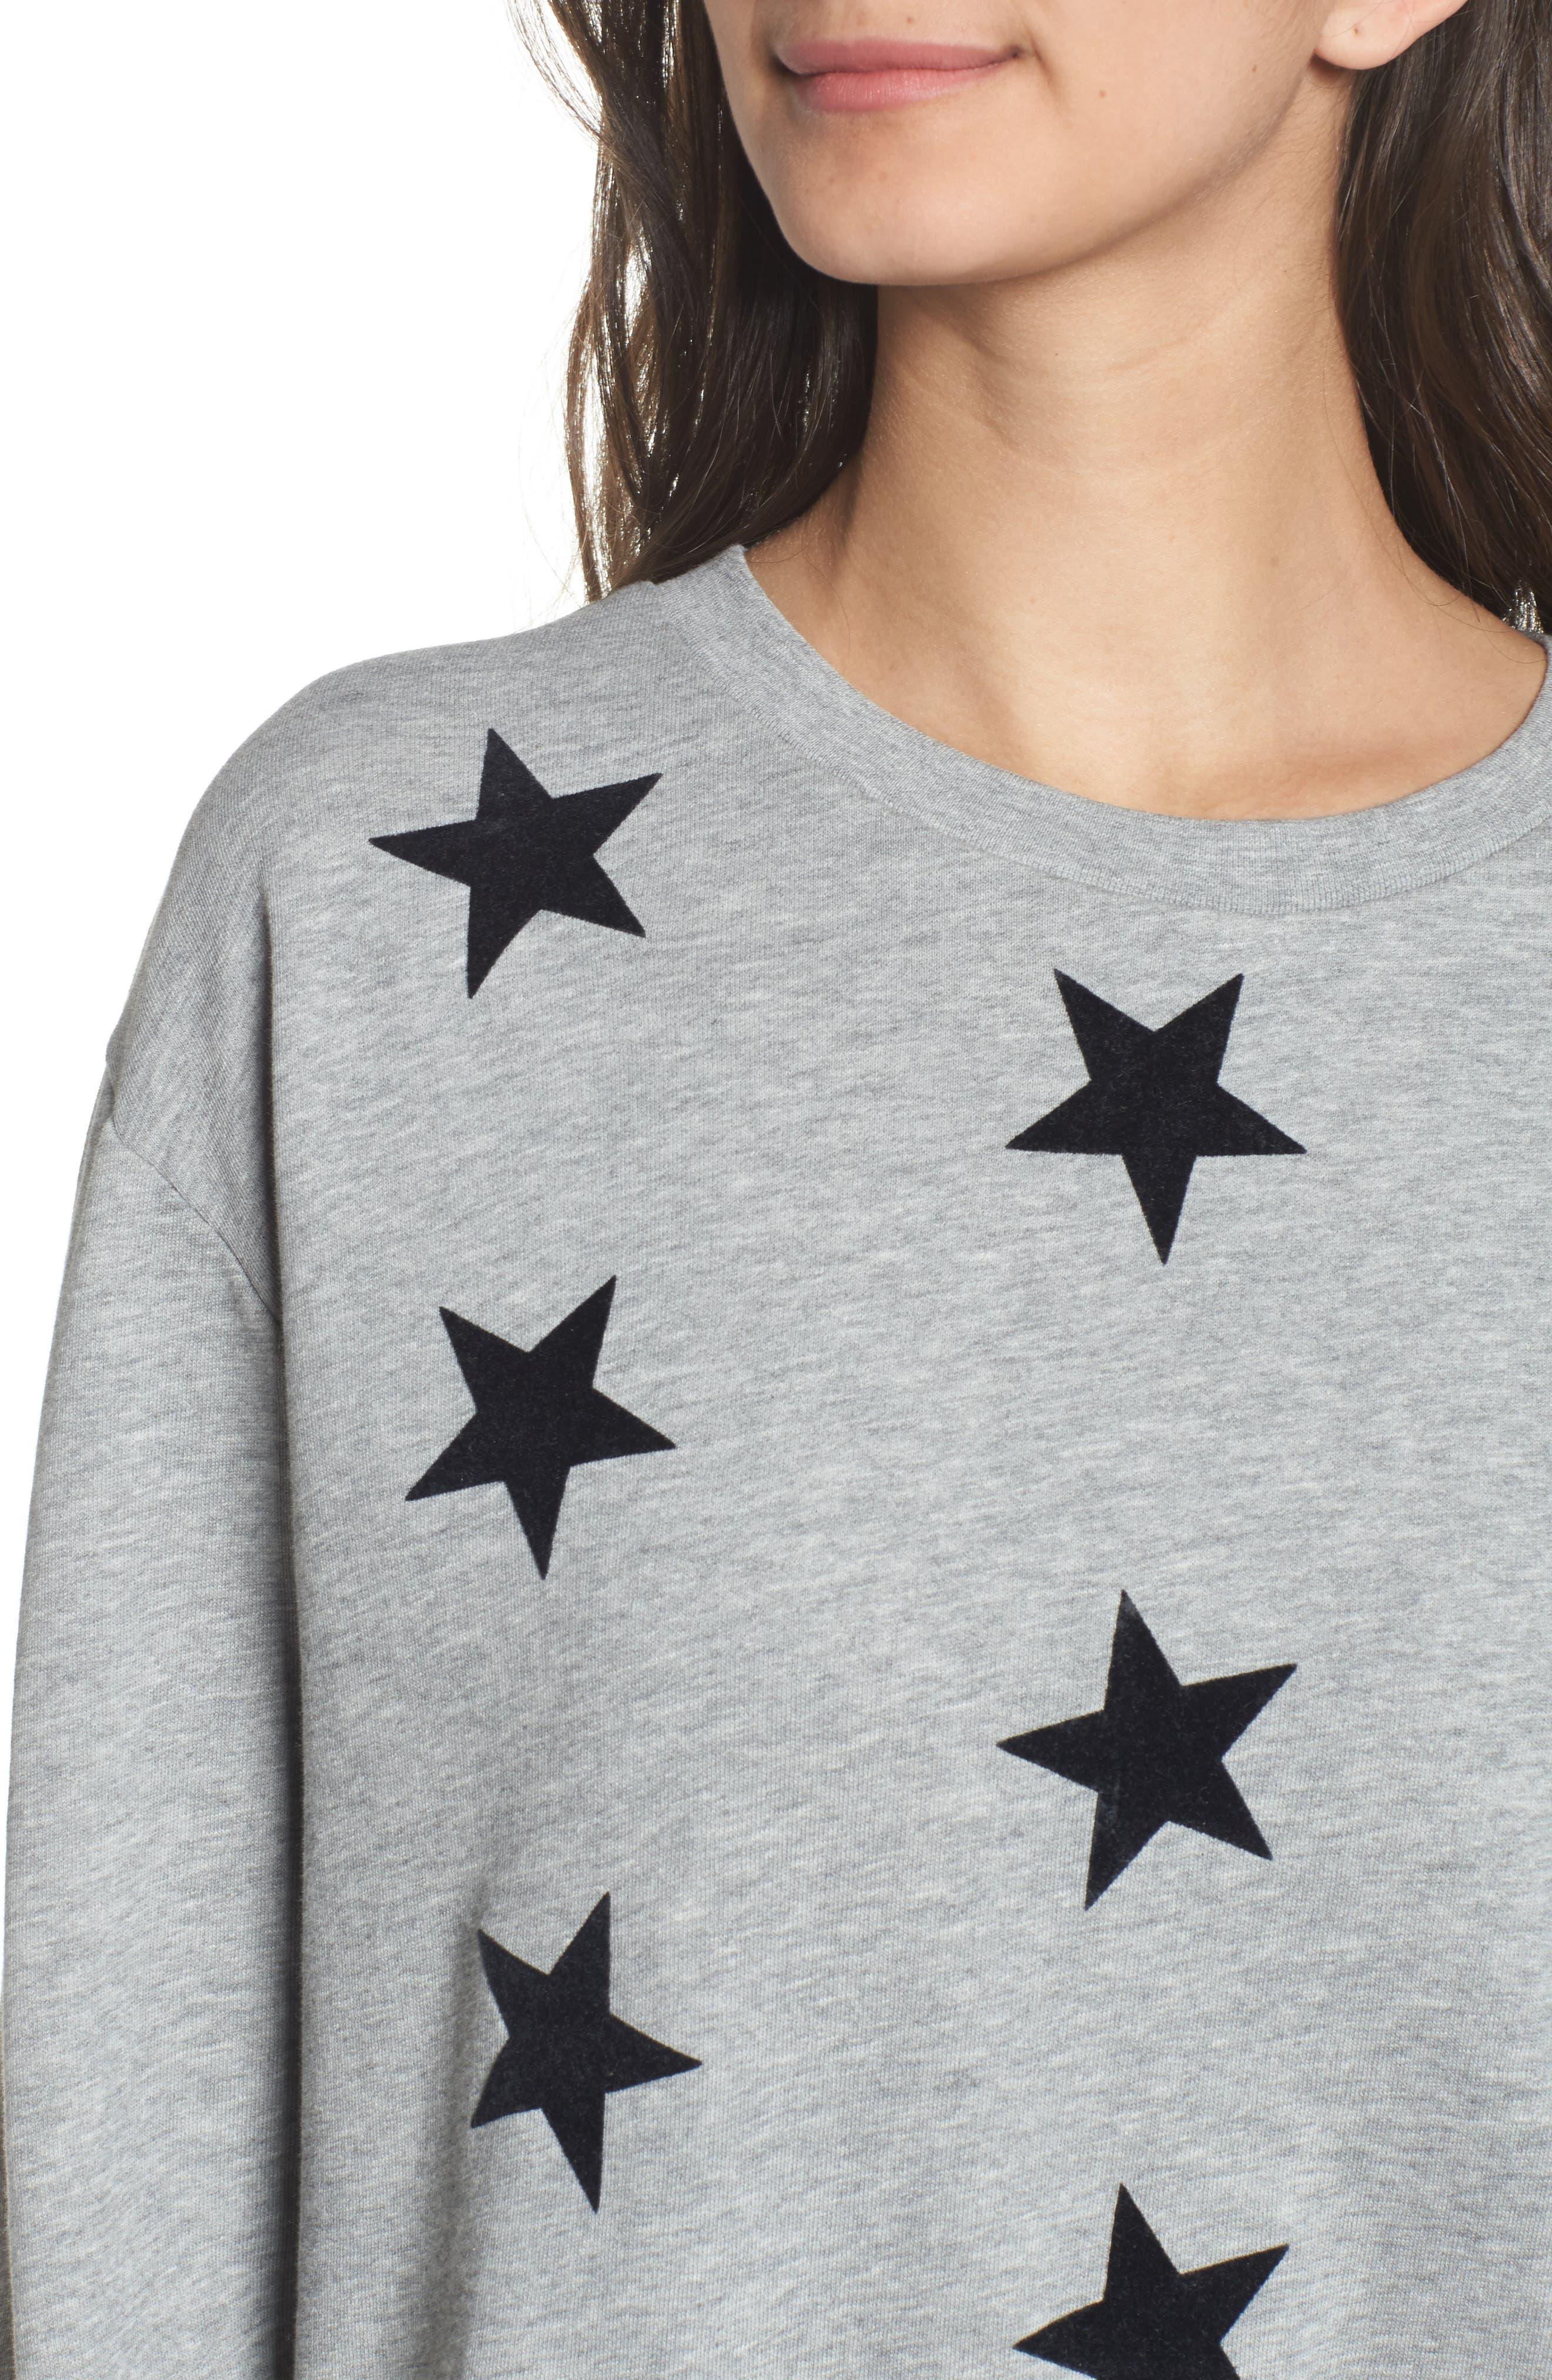 Alexa - Super Stars Sweatshirt,                             Alternate thumbnail 4, color,                             020